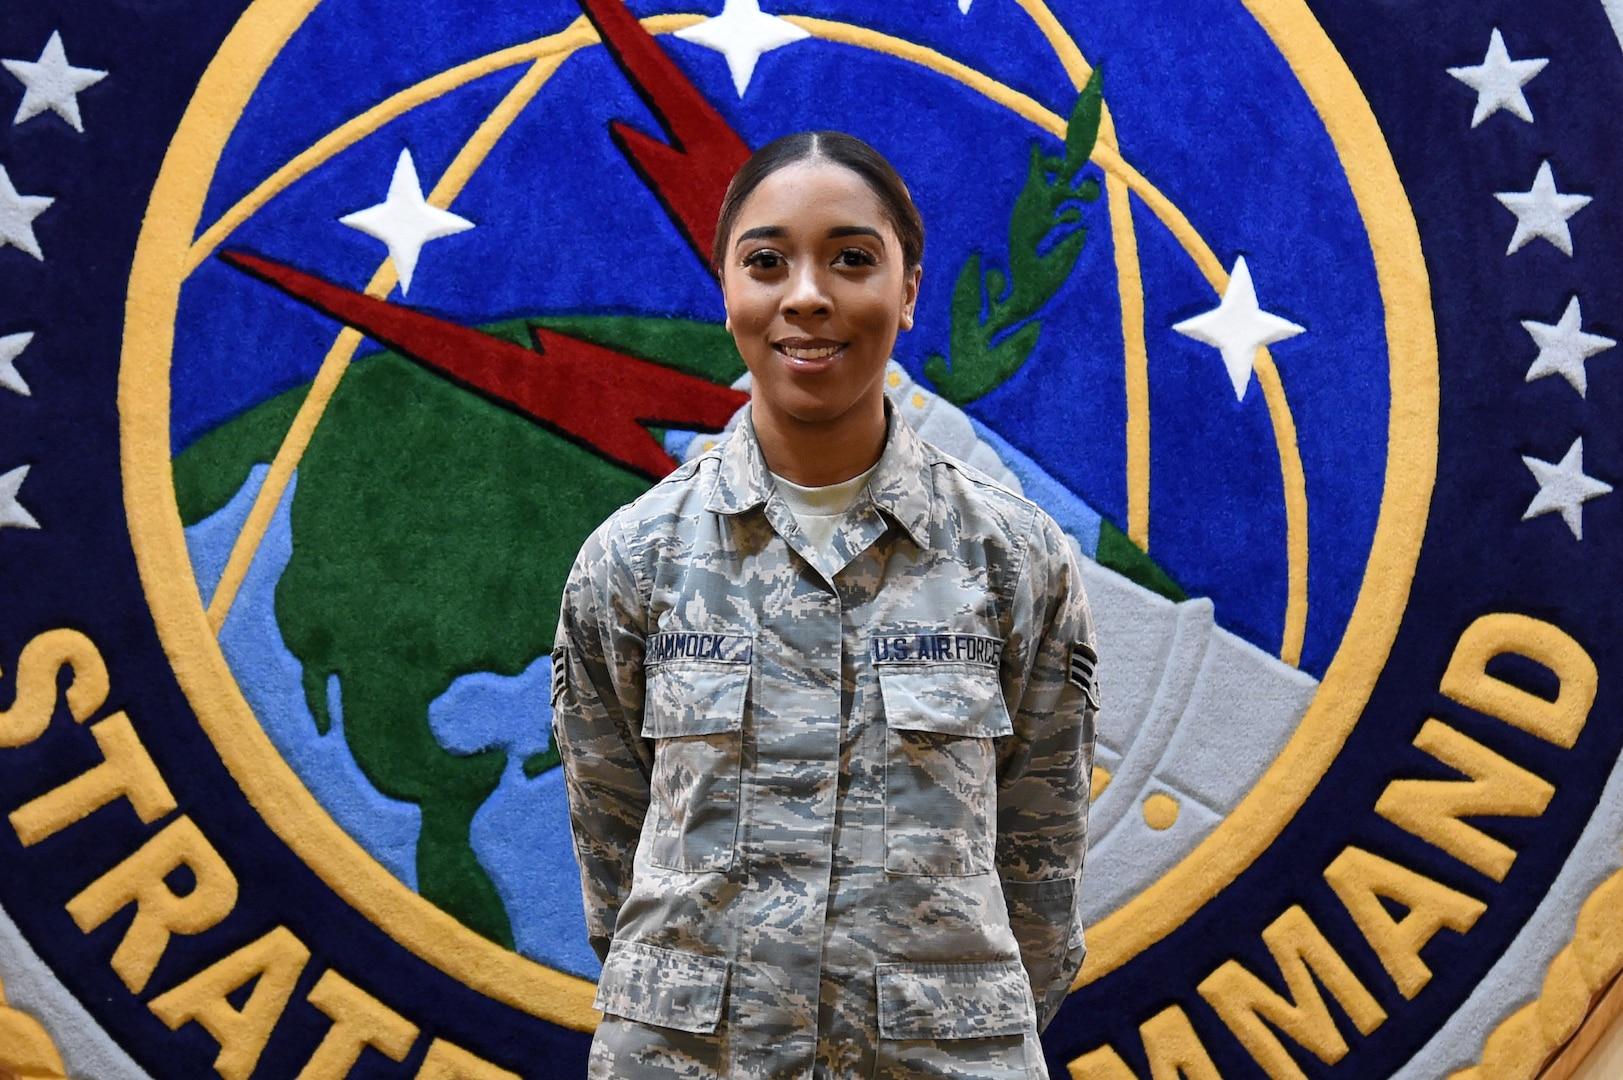 U.S. Air Force Senior Airman Rebecca Hammock, Enlisted Corps Spotlight for May